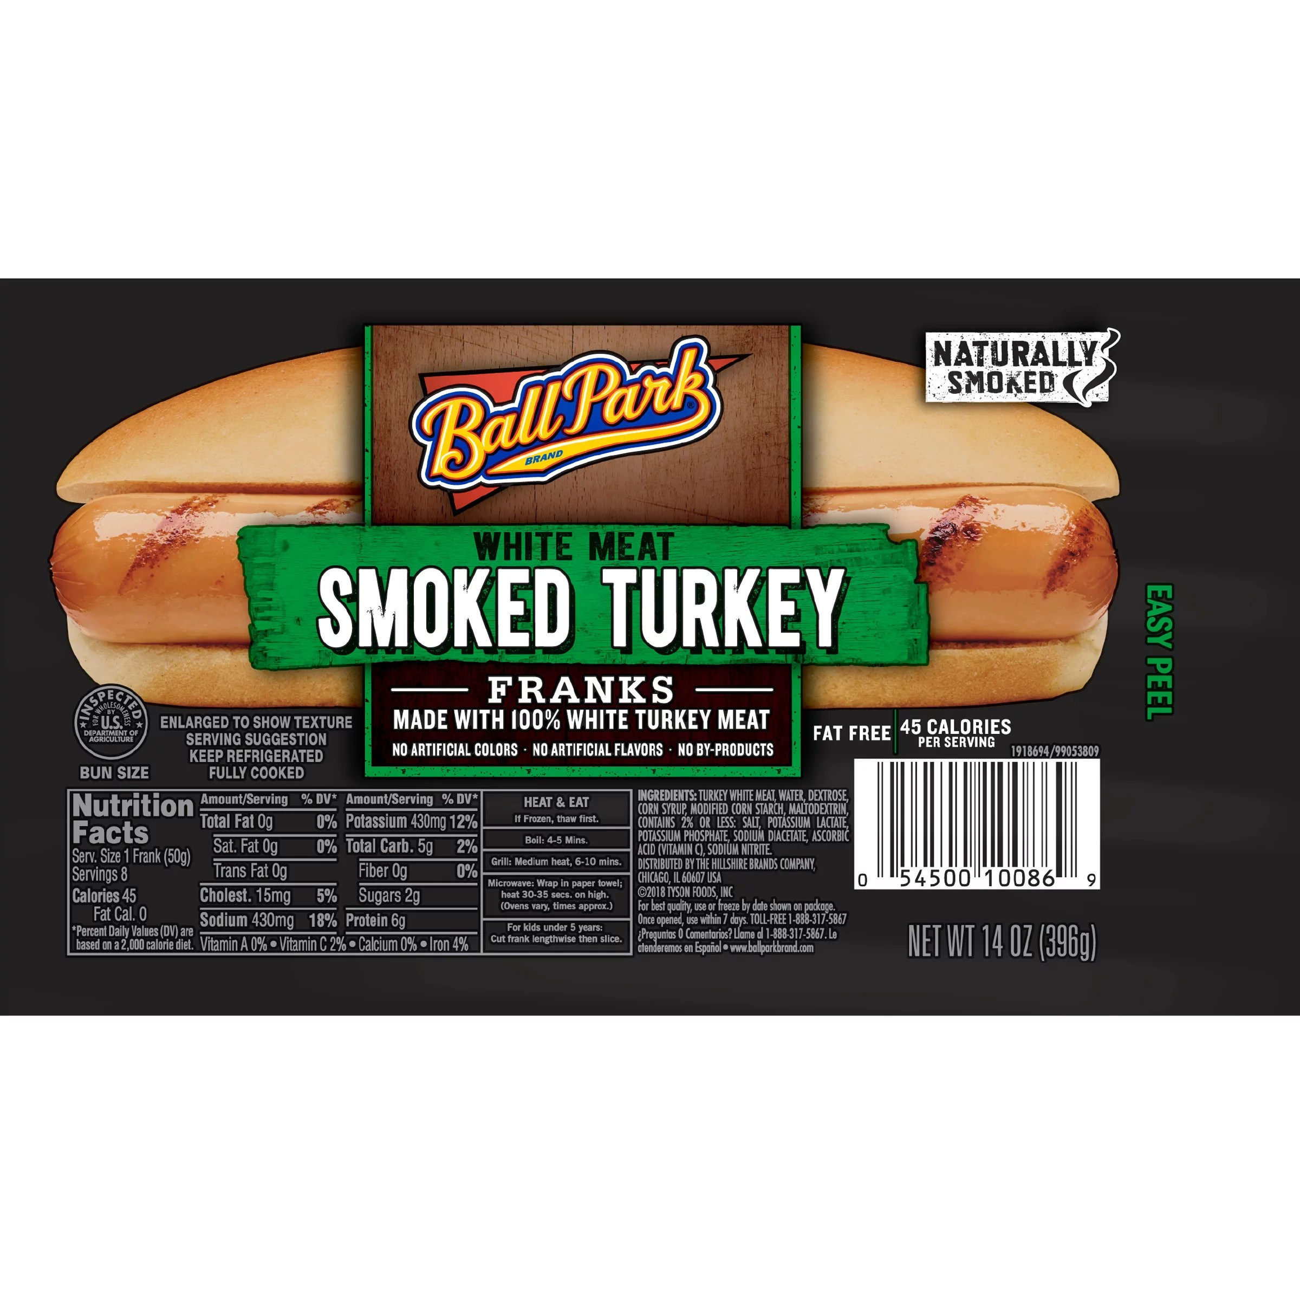 ball park smoked white meat turkey hot dogs bunsize length